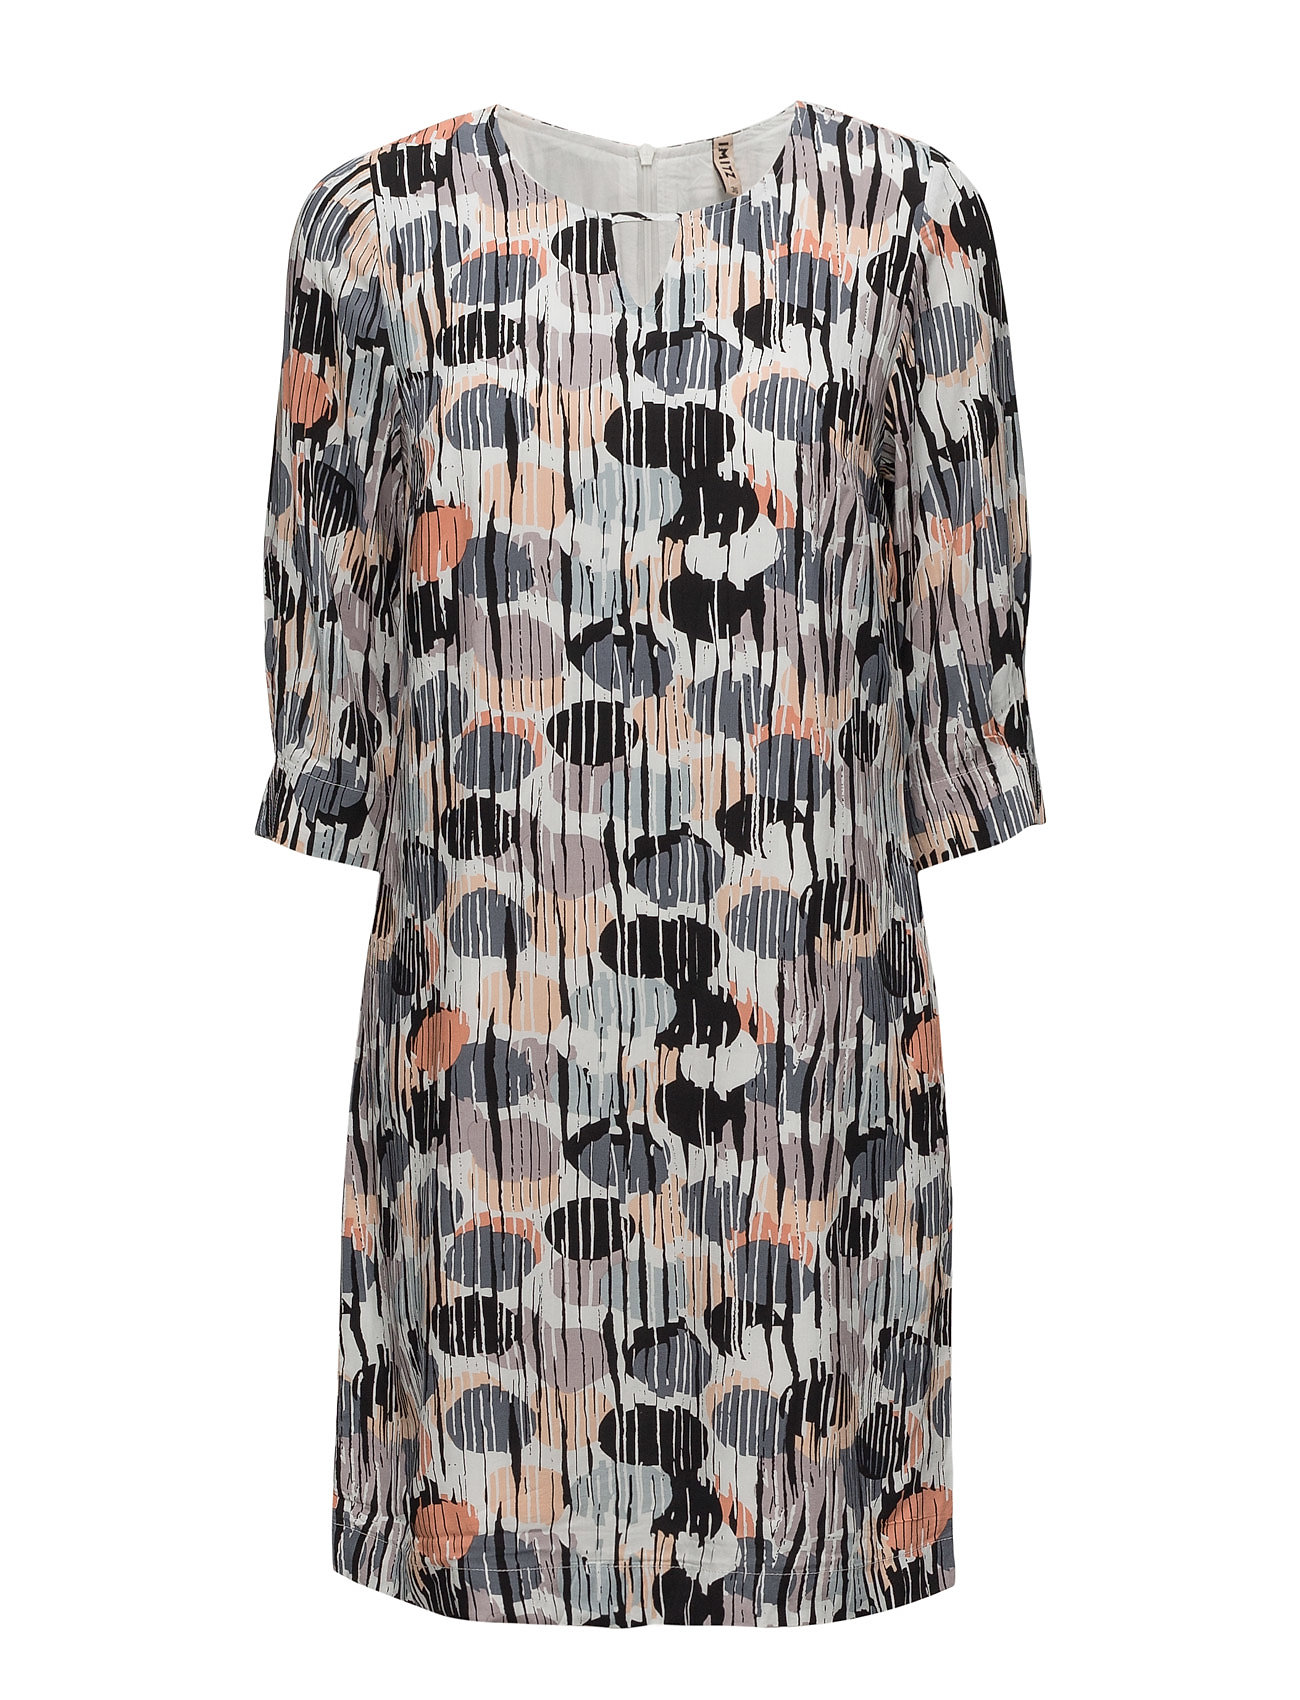 042687eb009c Køb Dress-Light Woven Imitz Kjoler i til Kvinder hos Boozt ...